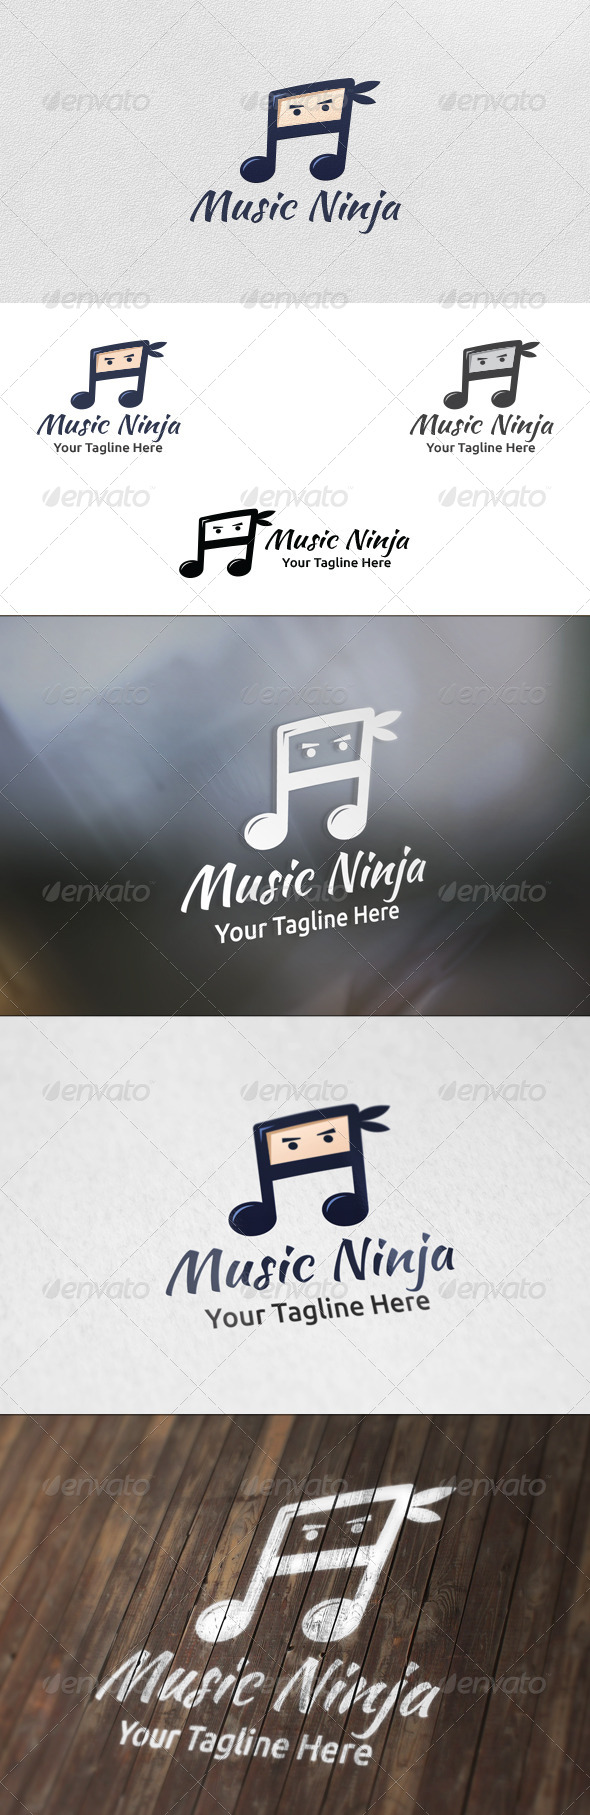 Music Ninja - Logo Template - Humans Logo Templates